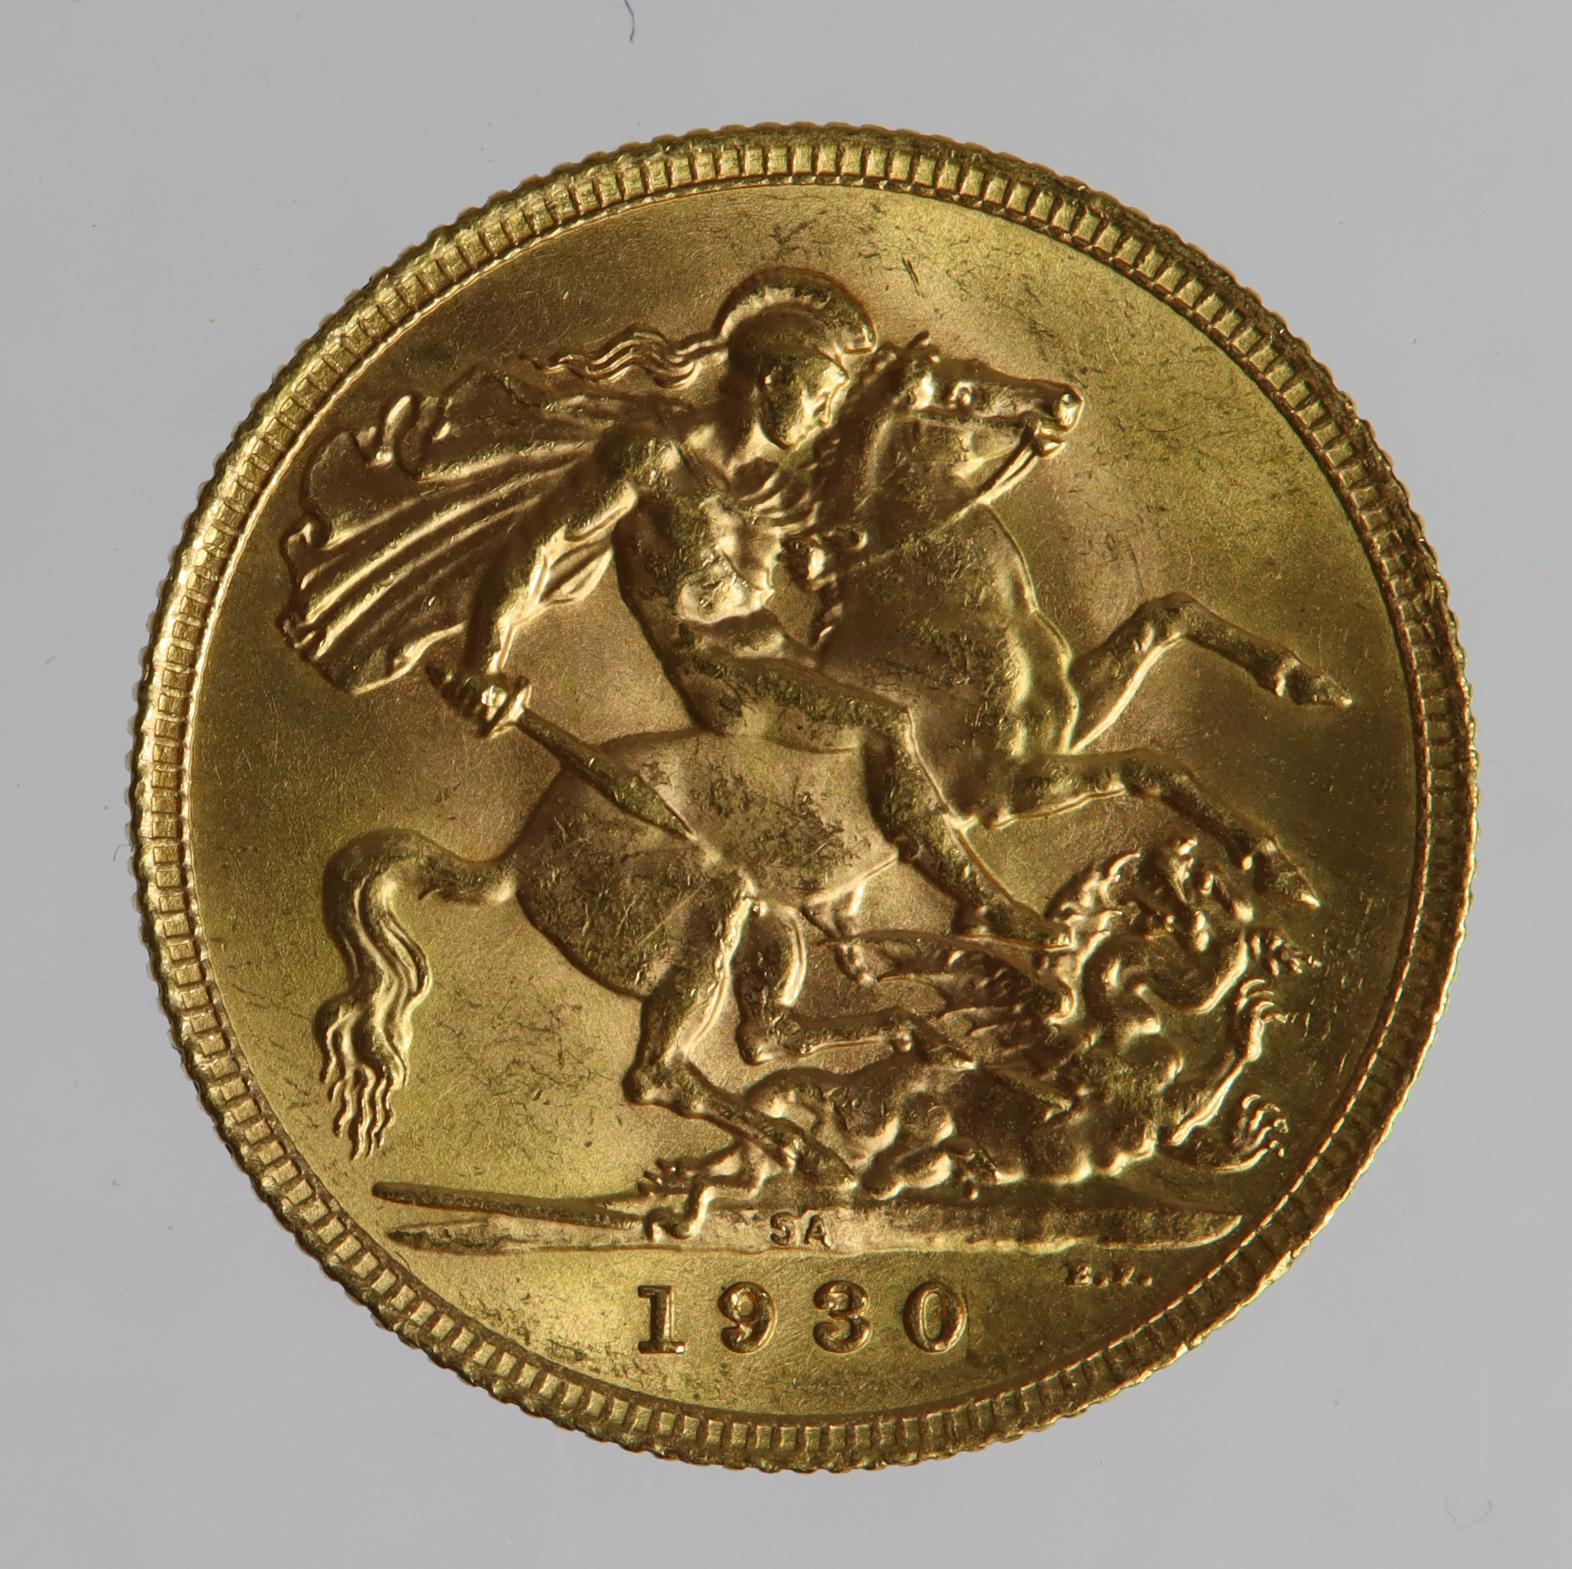 Sovereign 1930 SA, Pretoria Mint, South Africa, UNC - Image 2 of 2